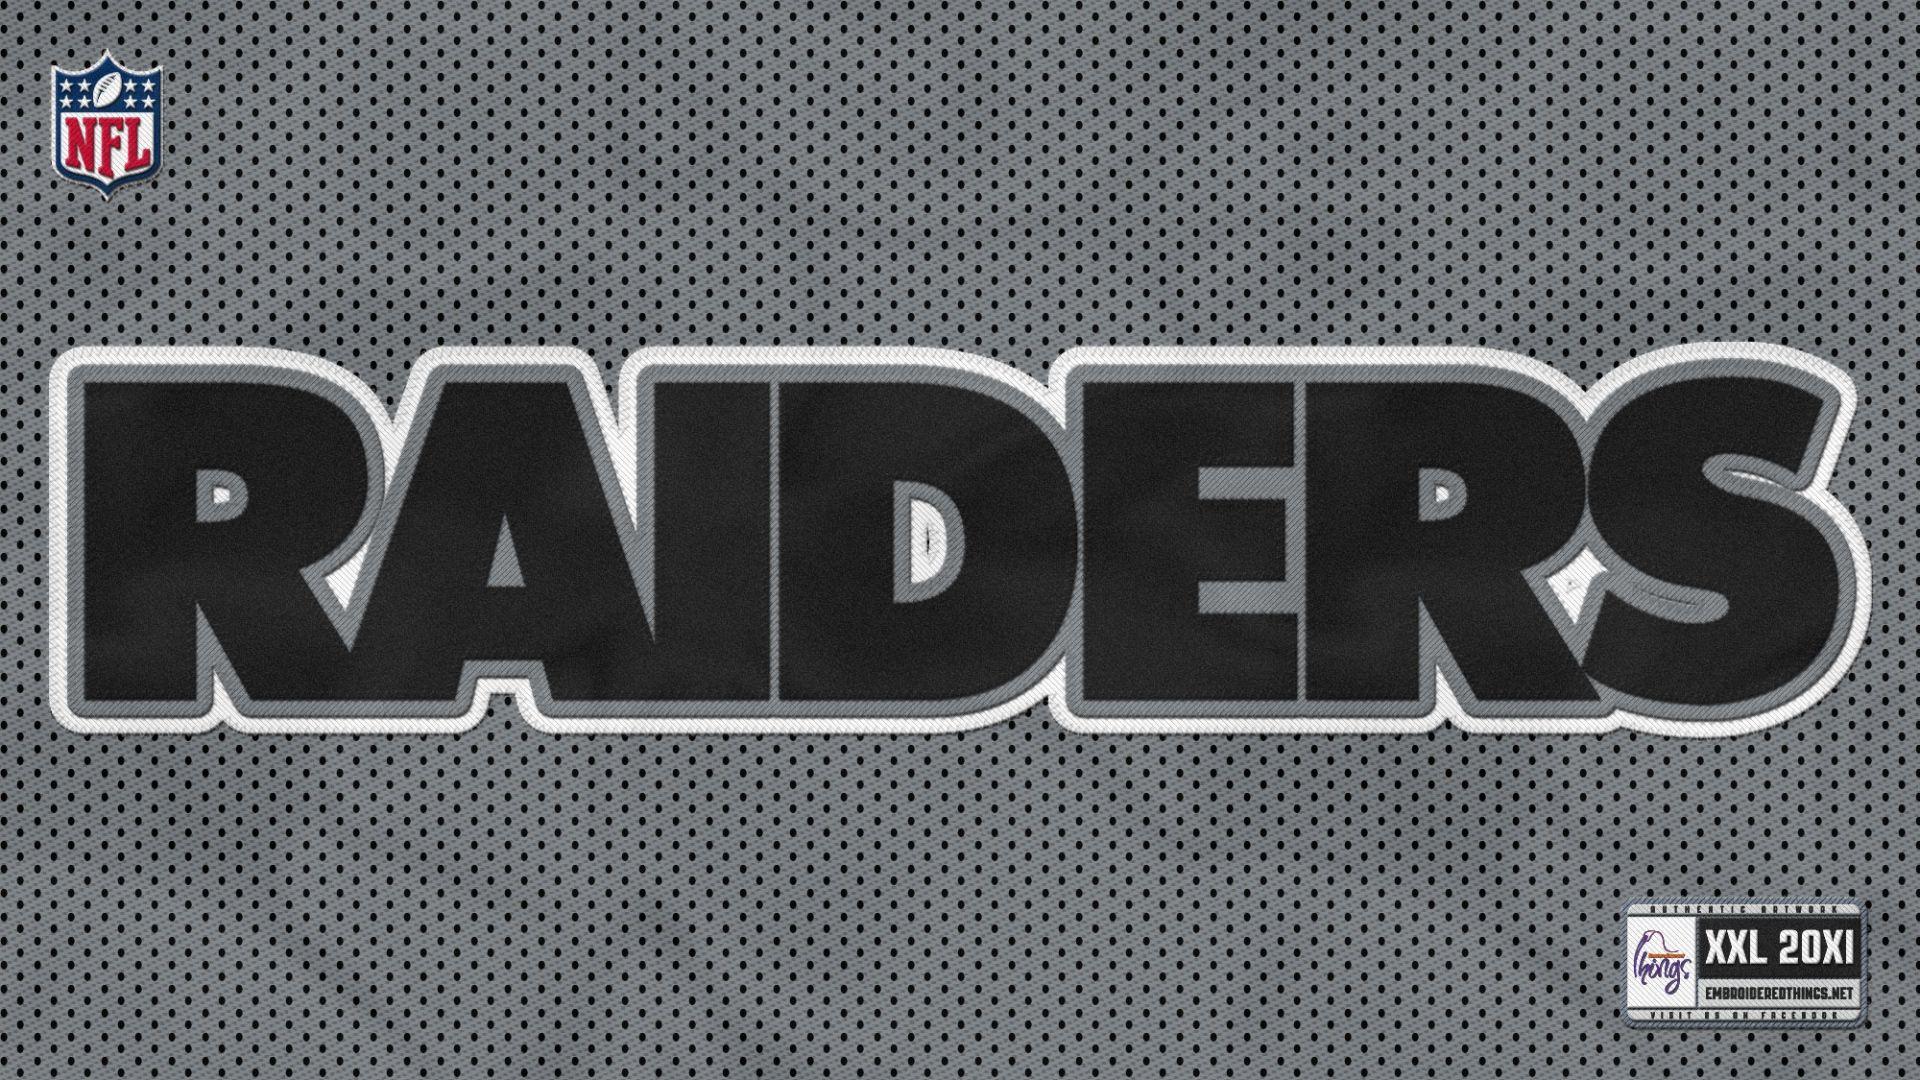 Los Angeles Raiders Wallpaper Oakland Raiders Wallpaper Hd6 Oakland Raiders Wallpapers Oakland Raiders Logo Raiders Wallpaper